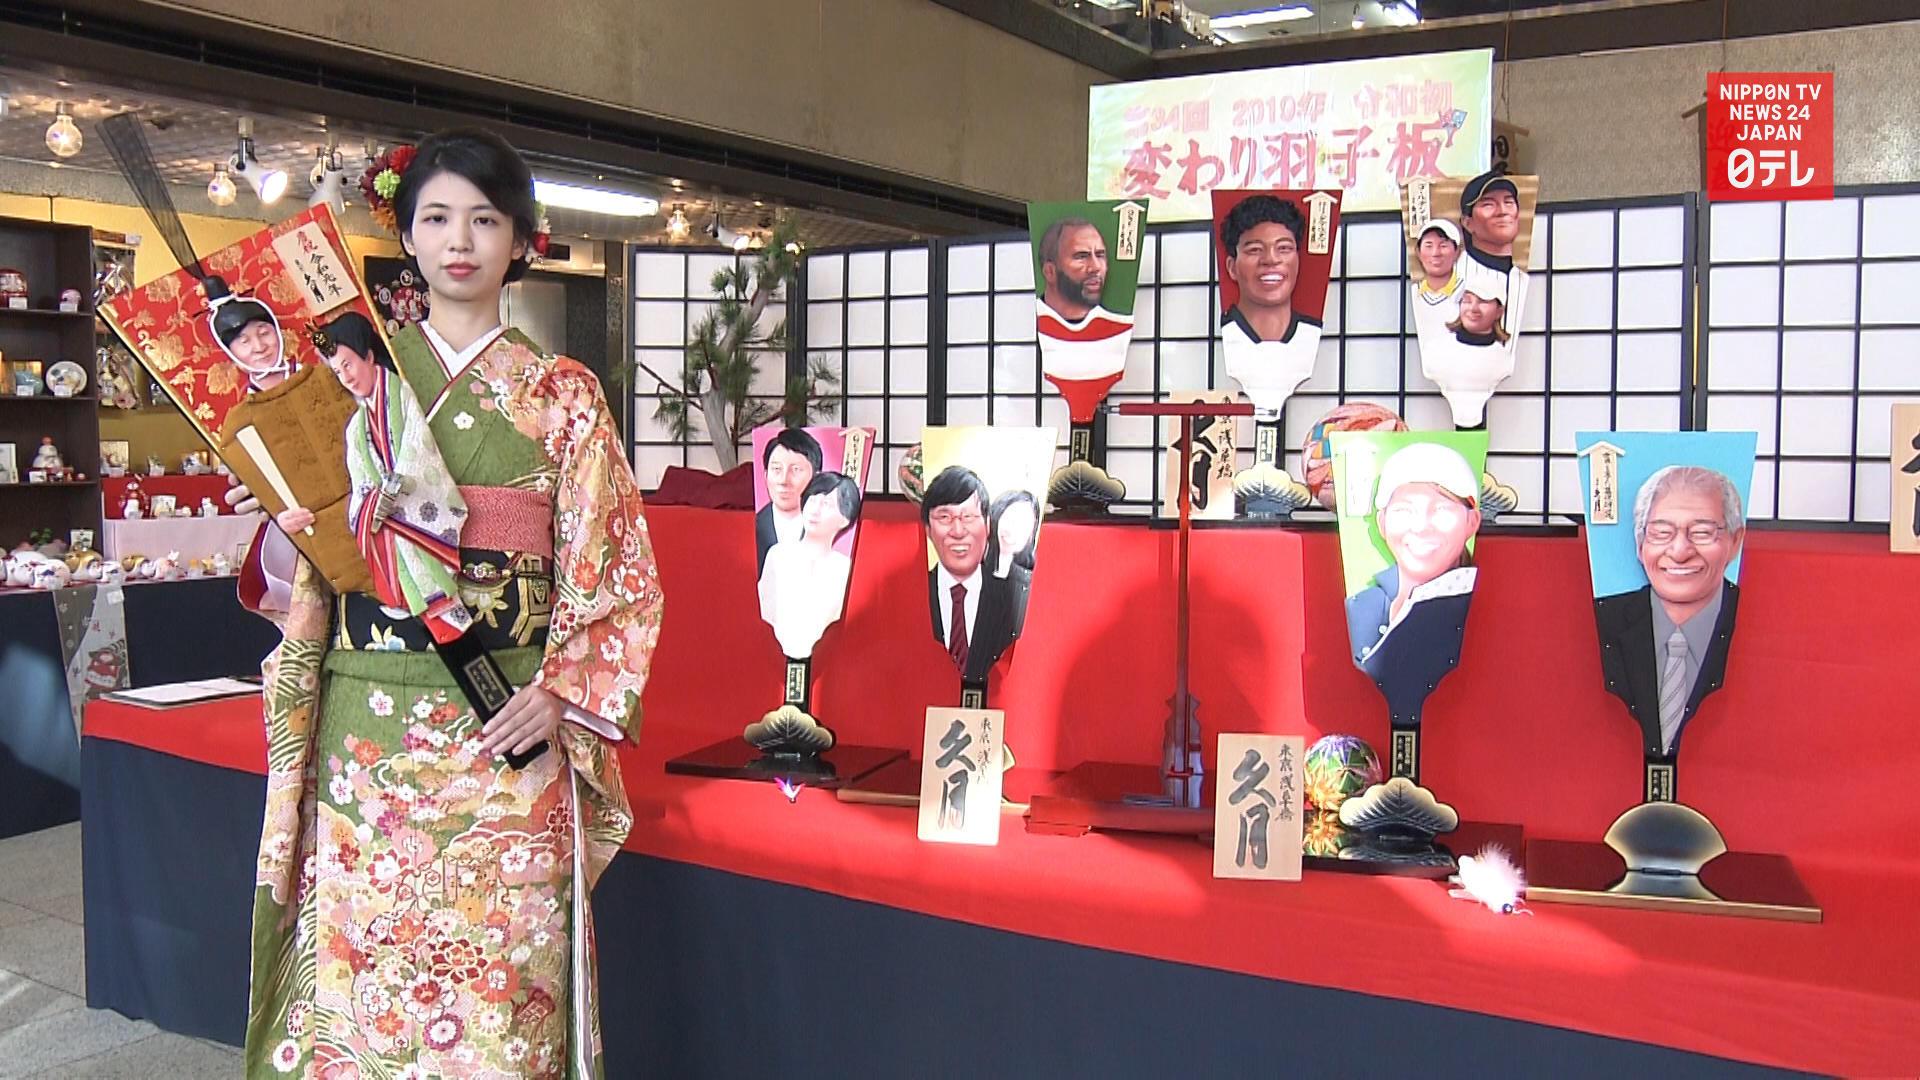 Tokyo doll shop unveils decorative rackets